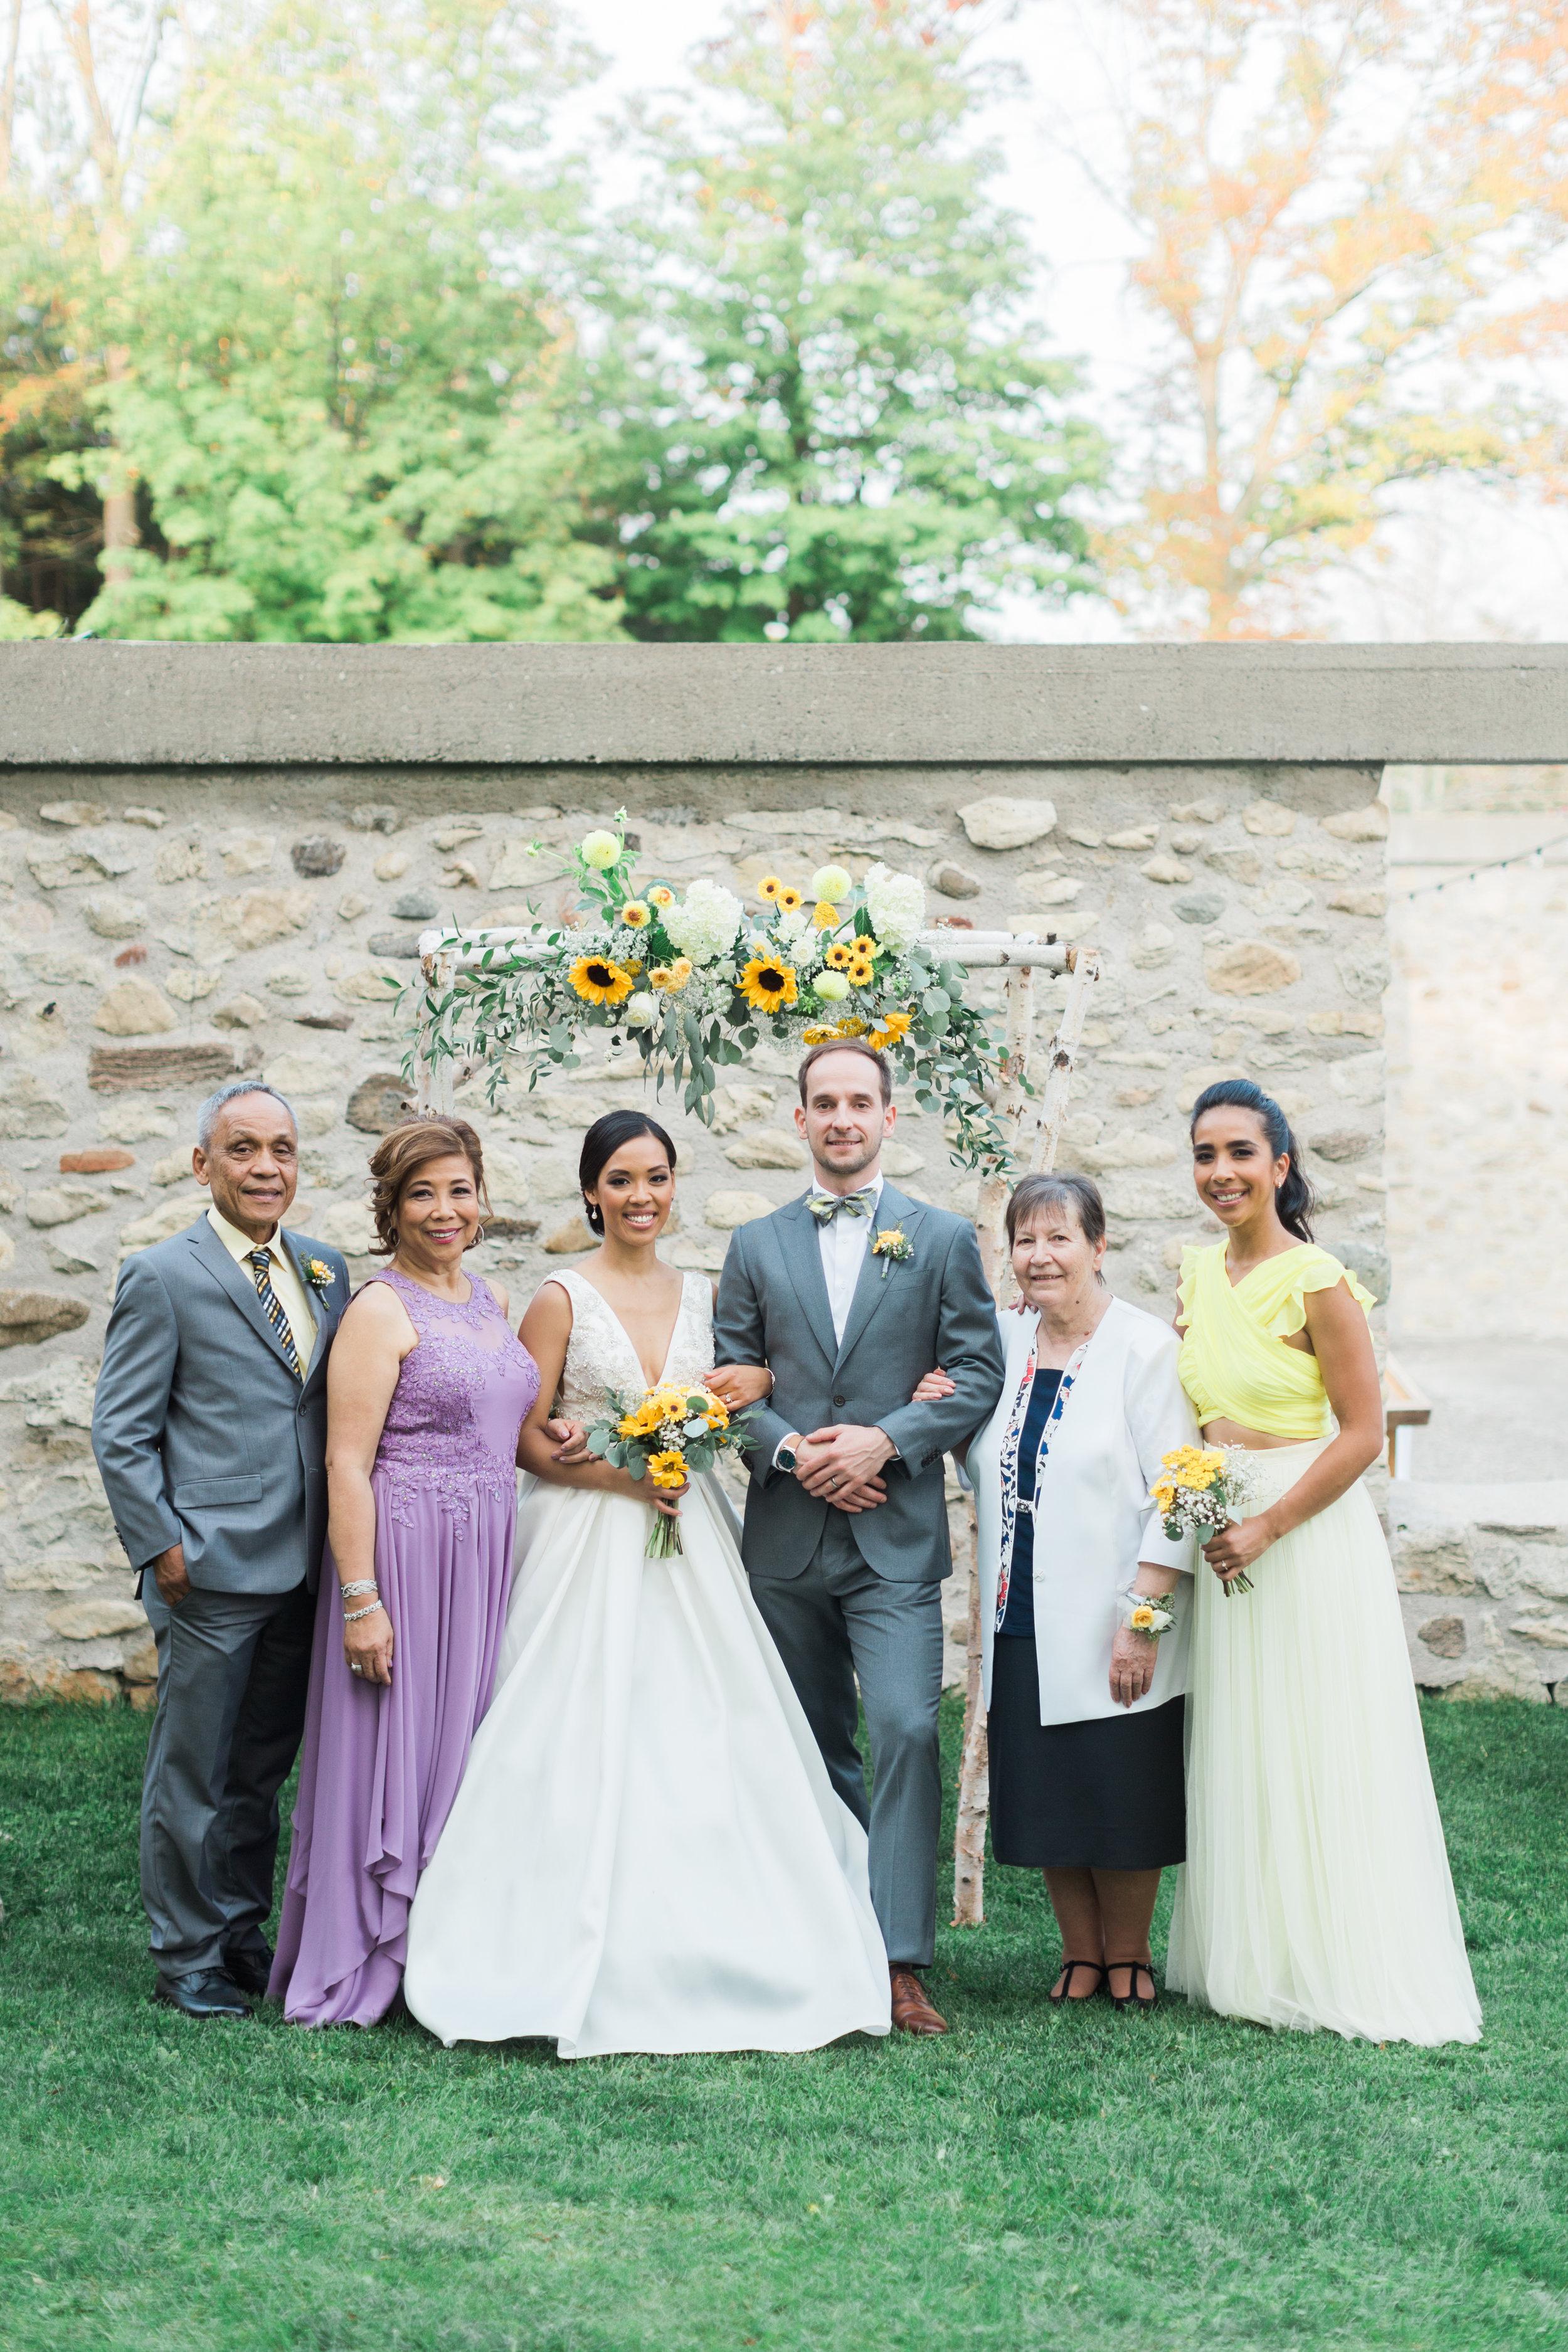 Alton Mills Wedding - Ceremony-91.jpg